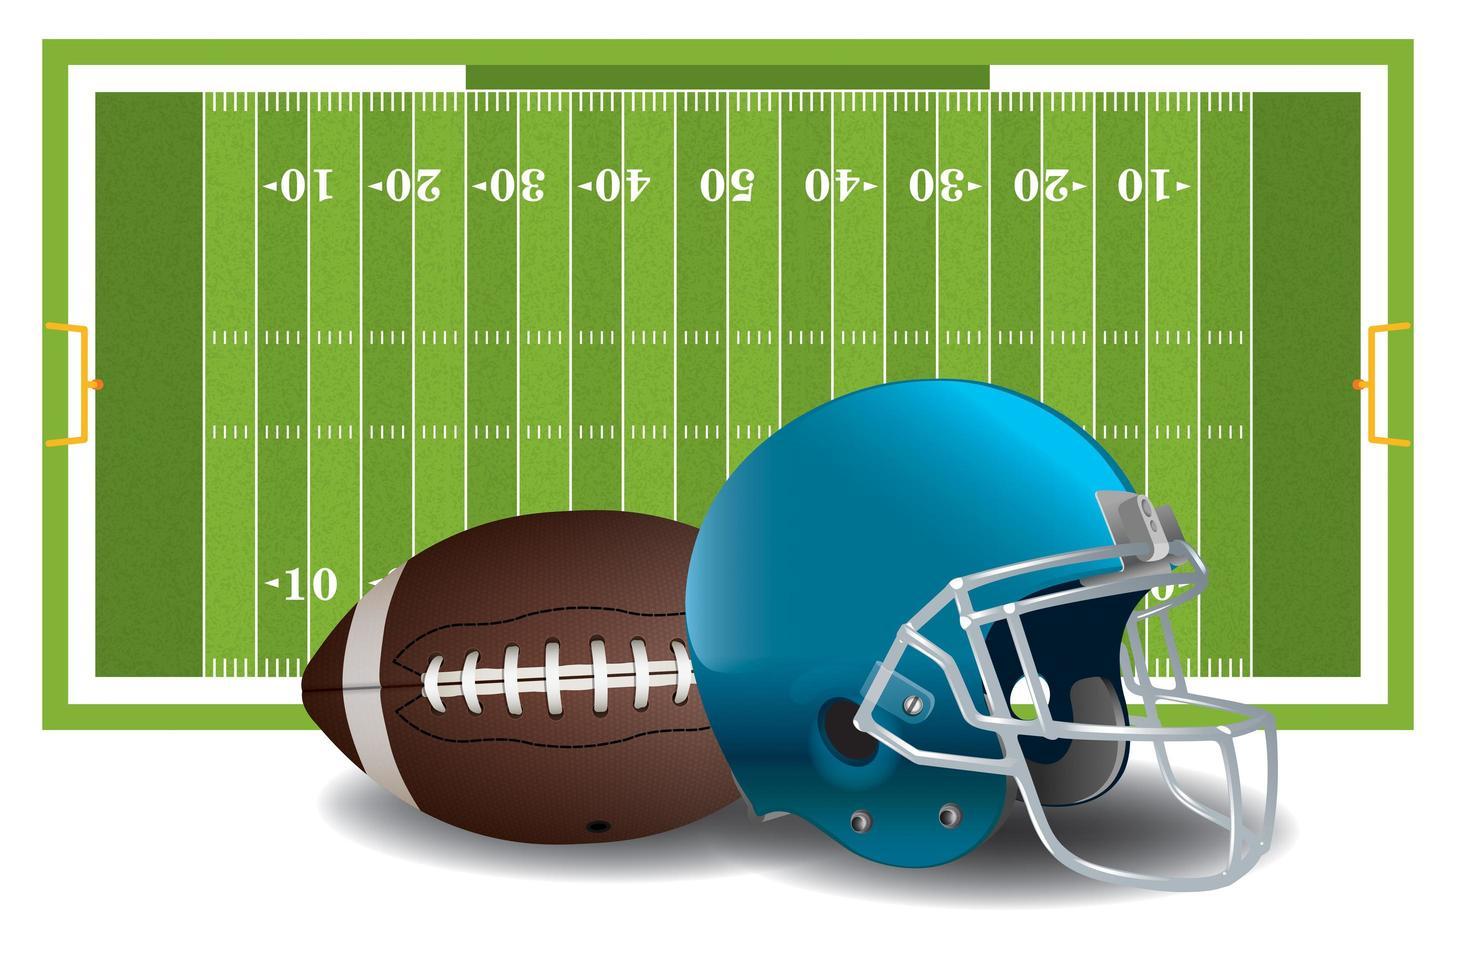 elementos de futebol americano vetor